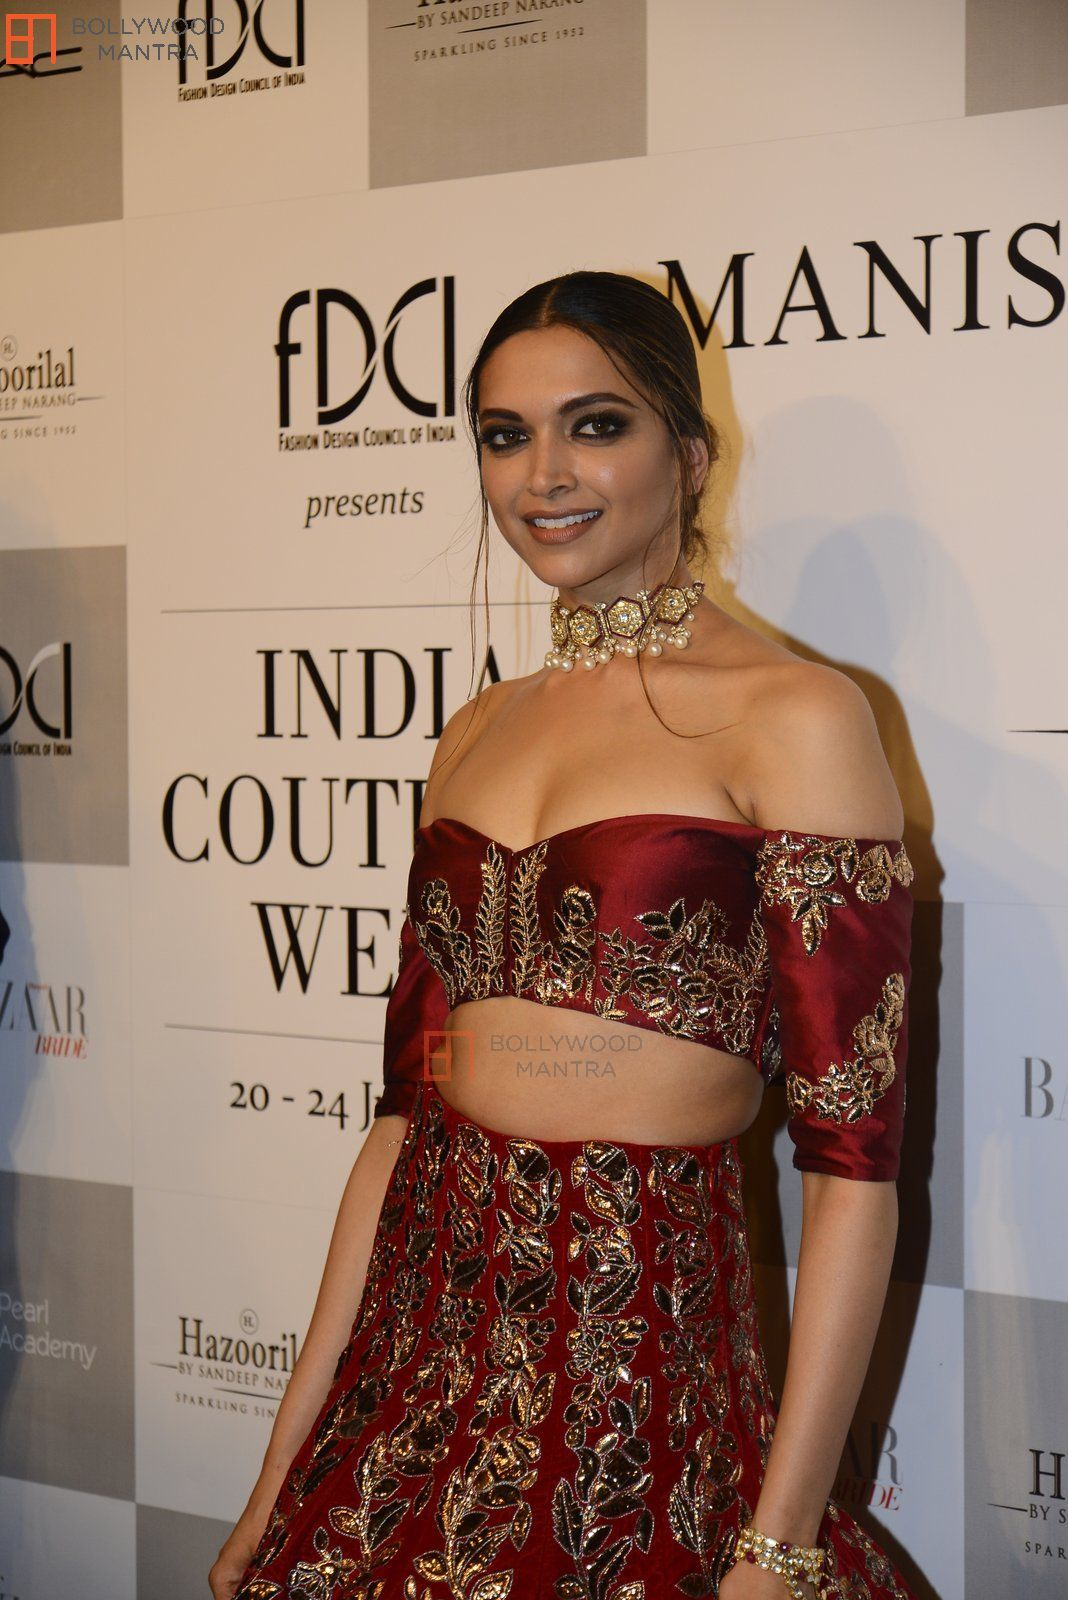 Told to get a boob job, Deepika Padukone's stunning revelation